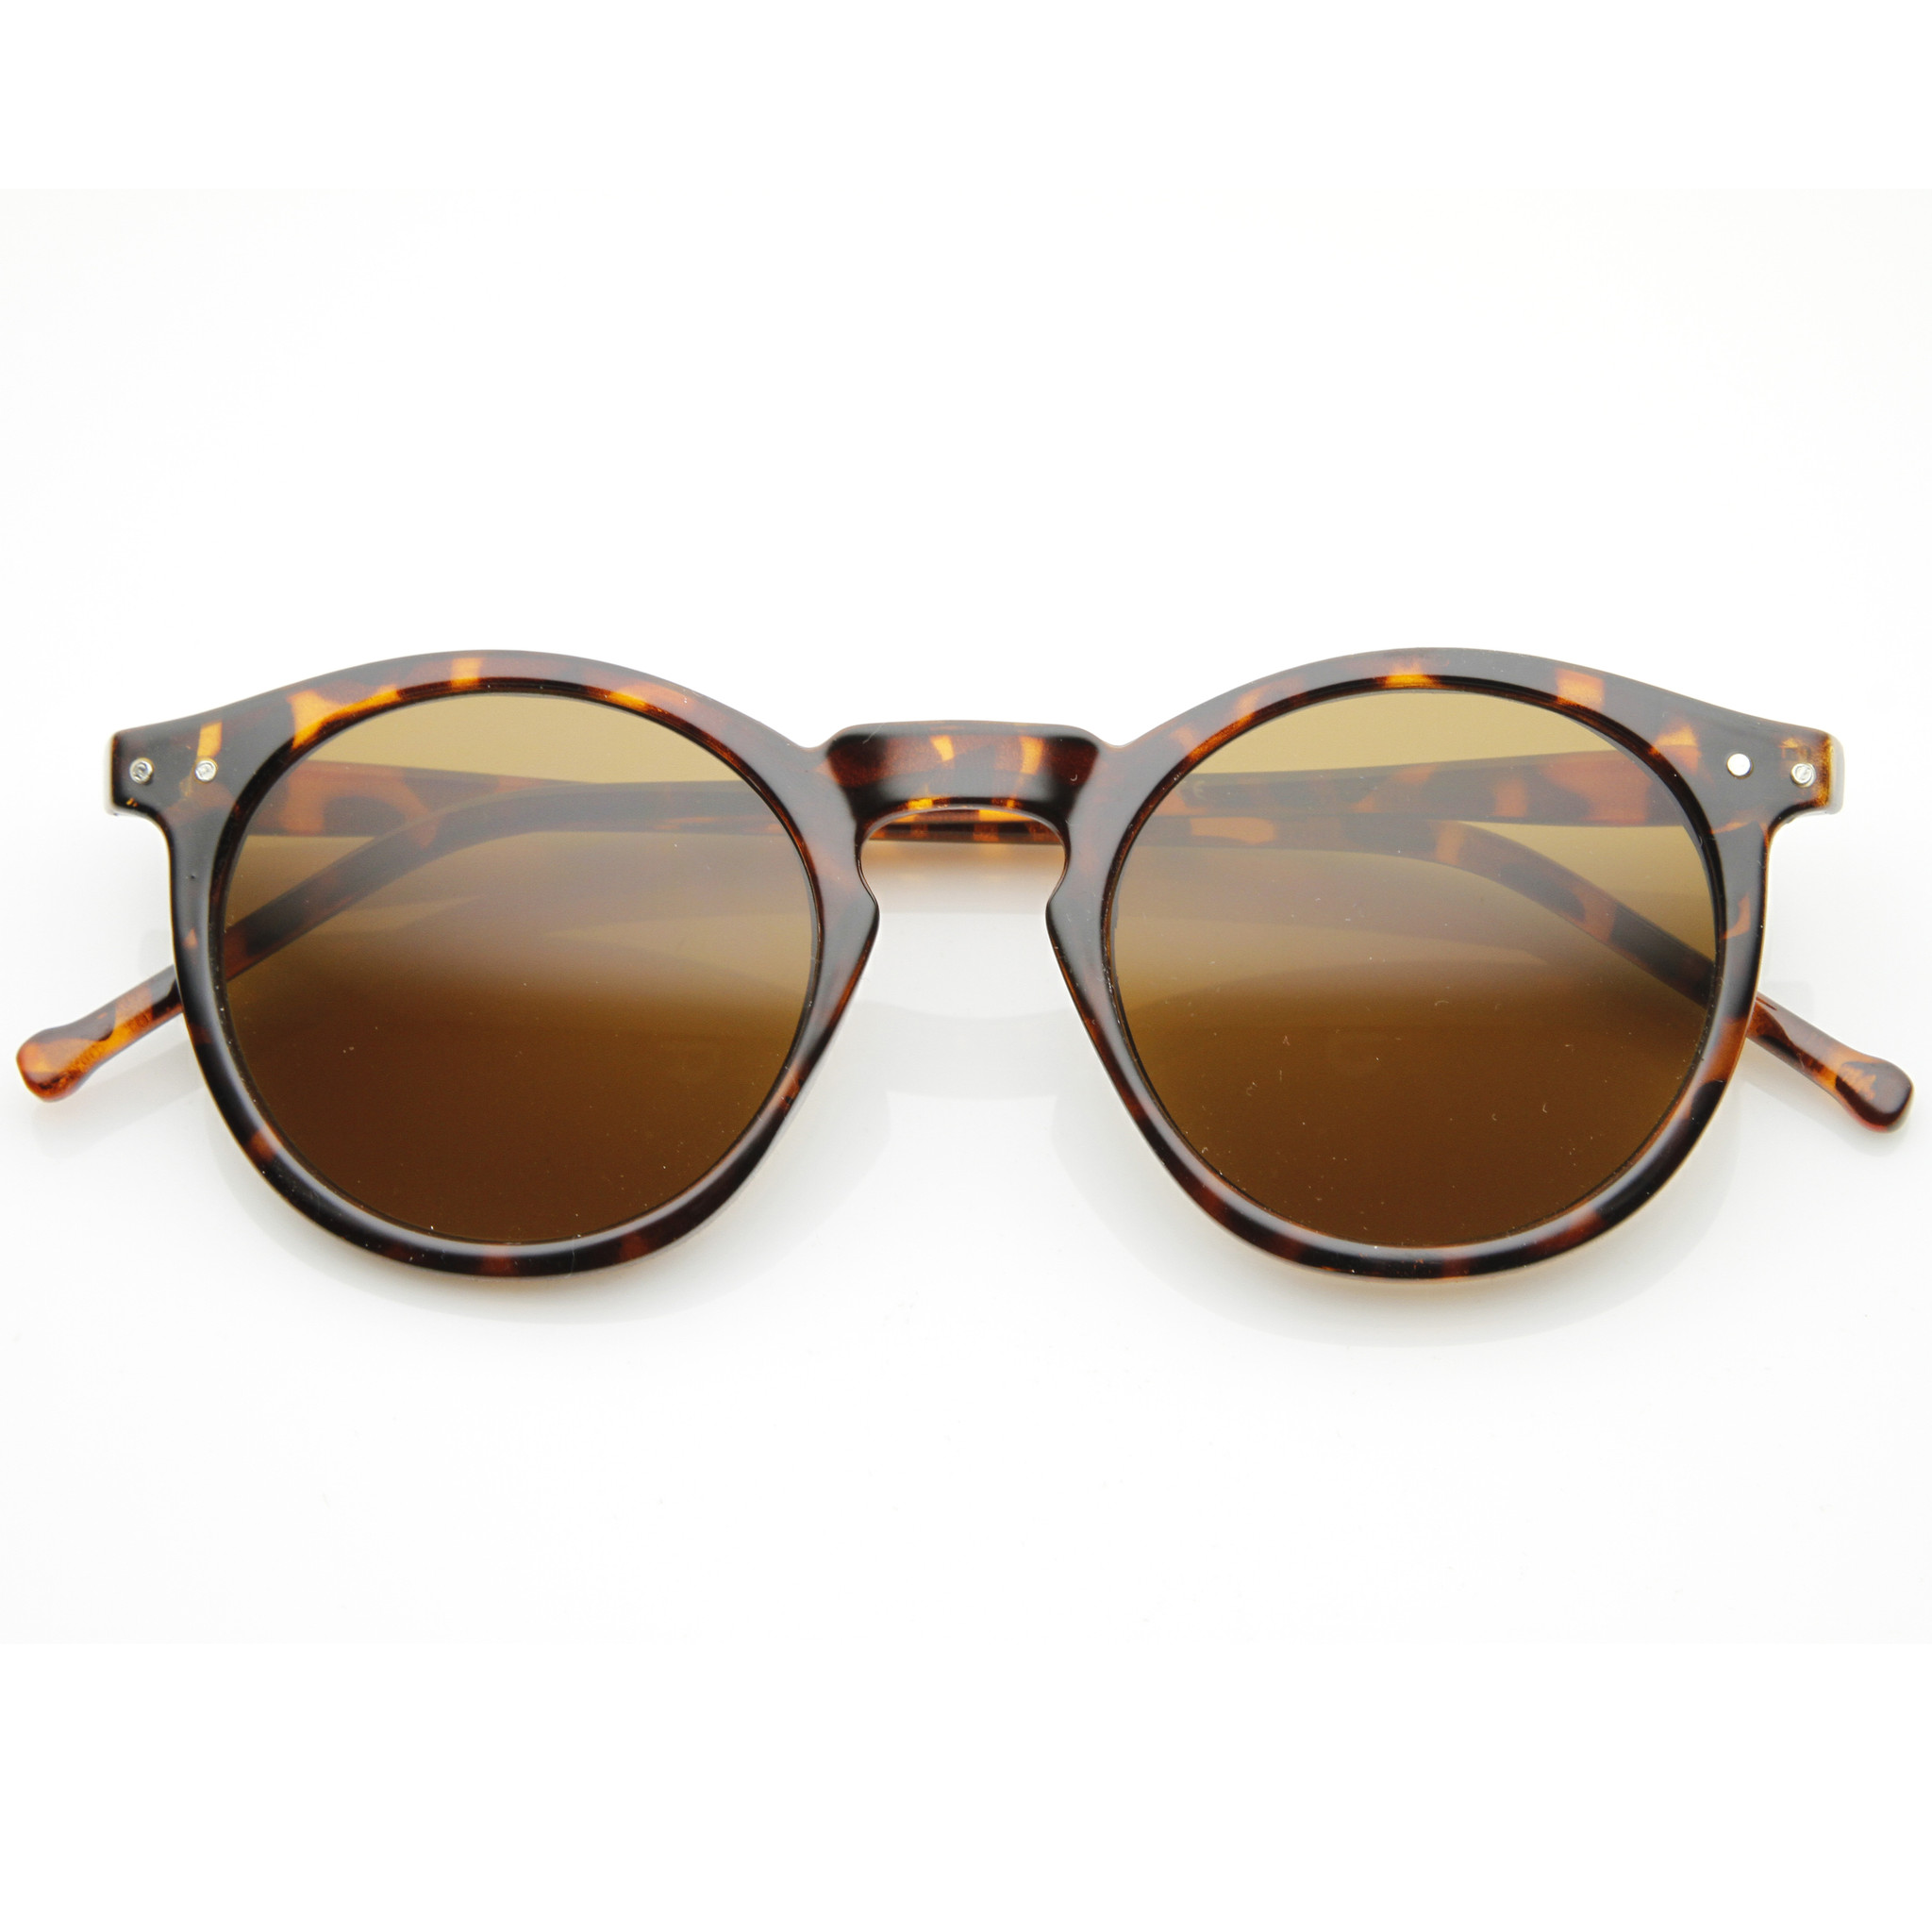 c75a79982f 1920 s P3 Dapper Vintage Inspired Round Sunglasses 8637